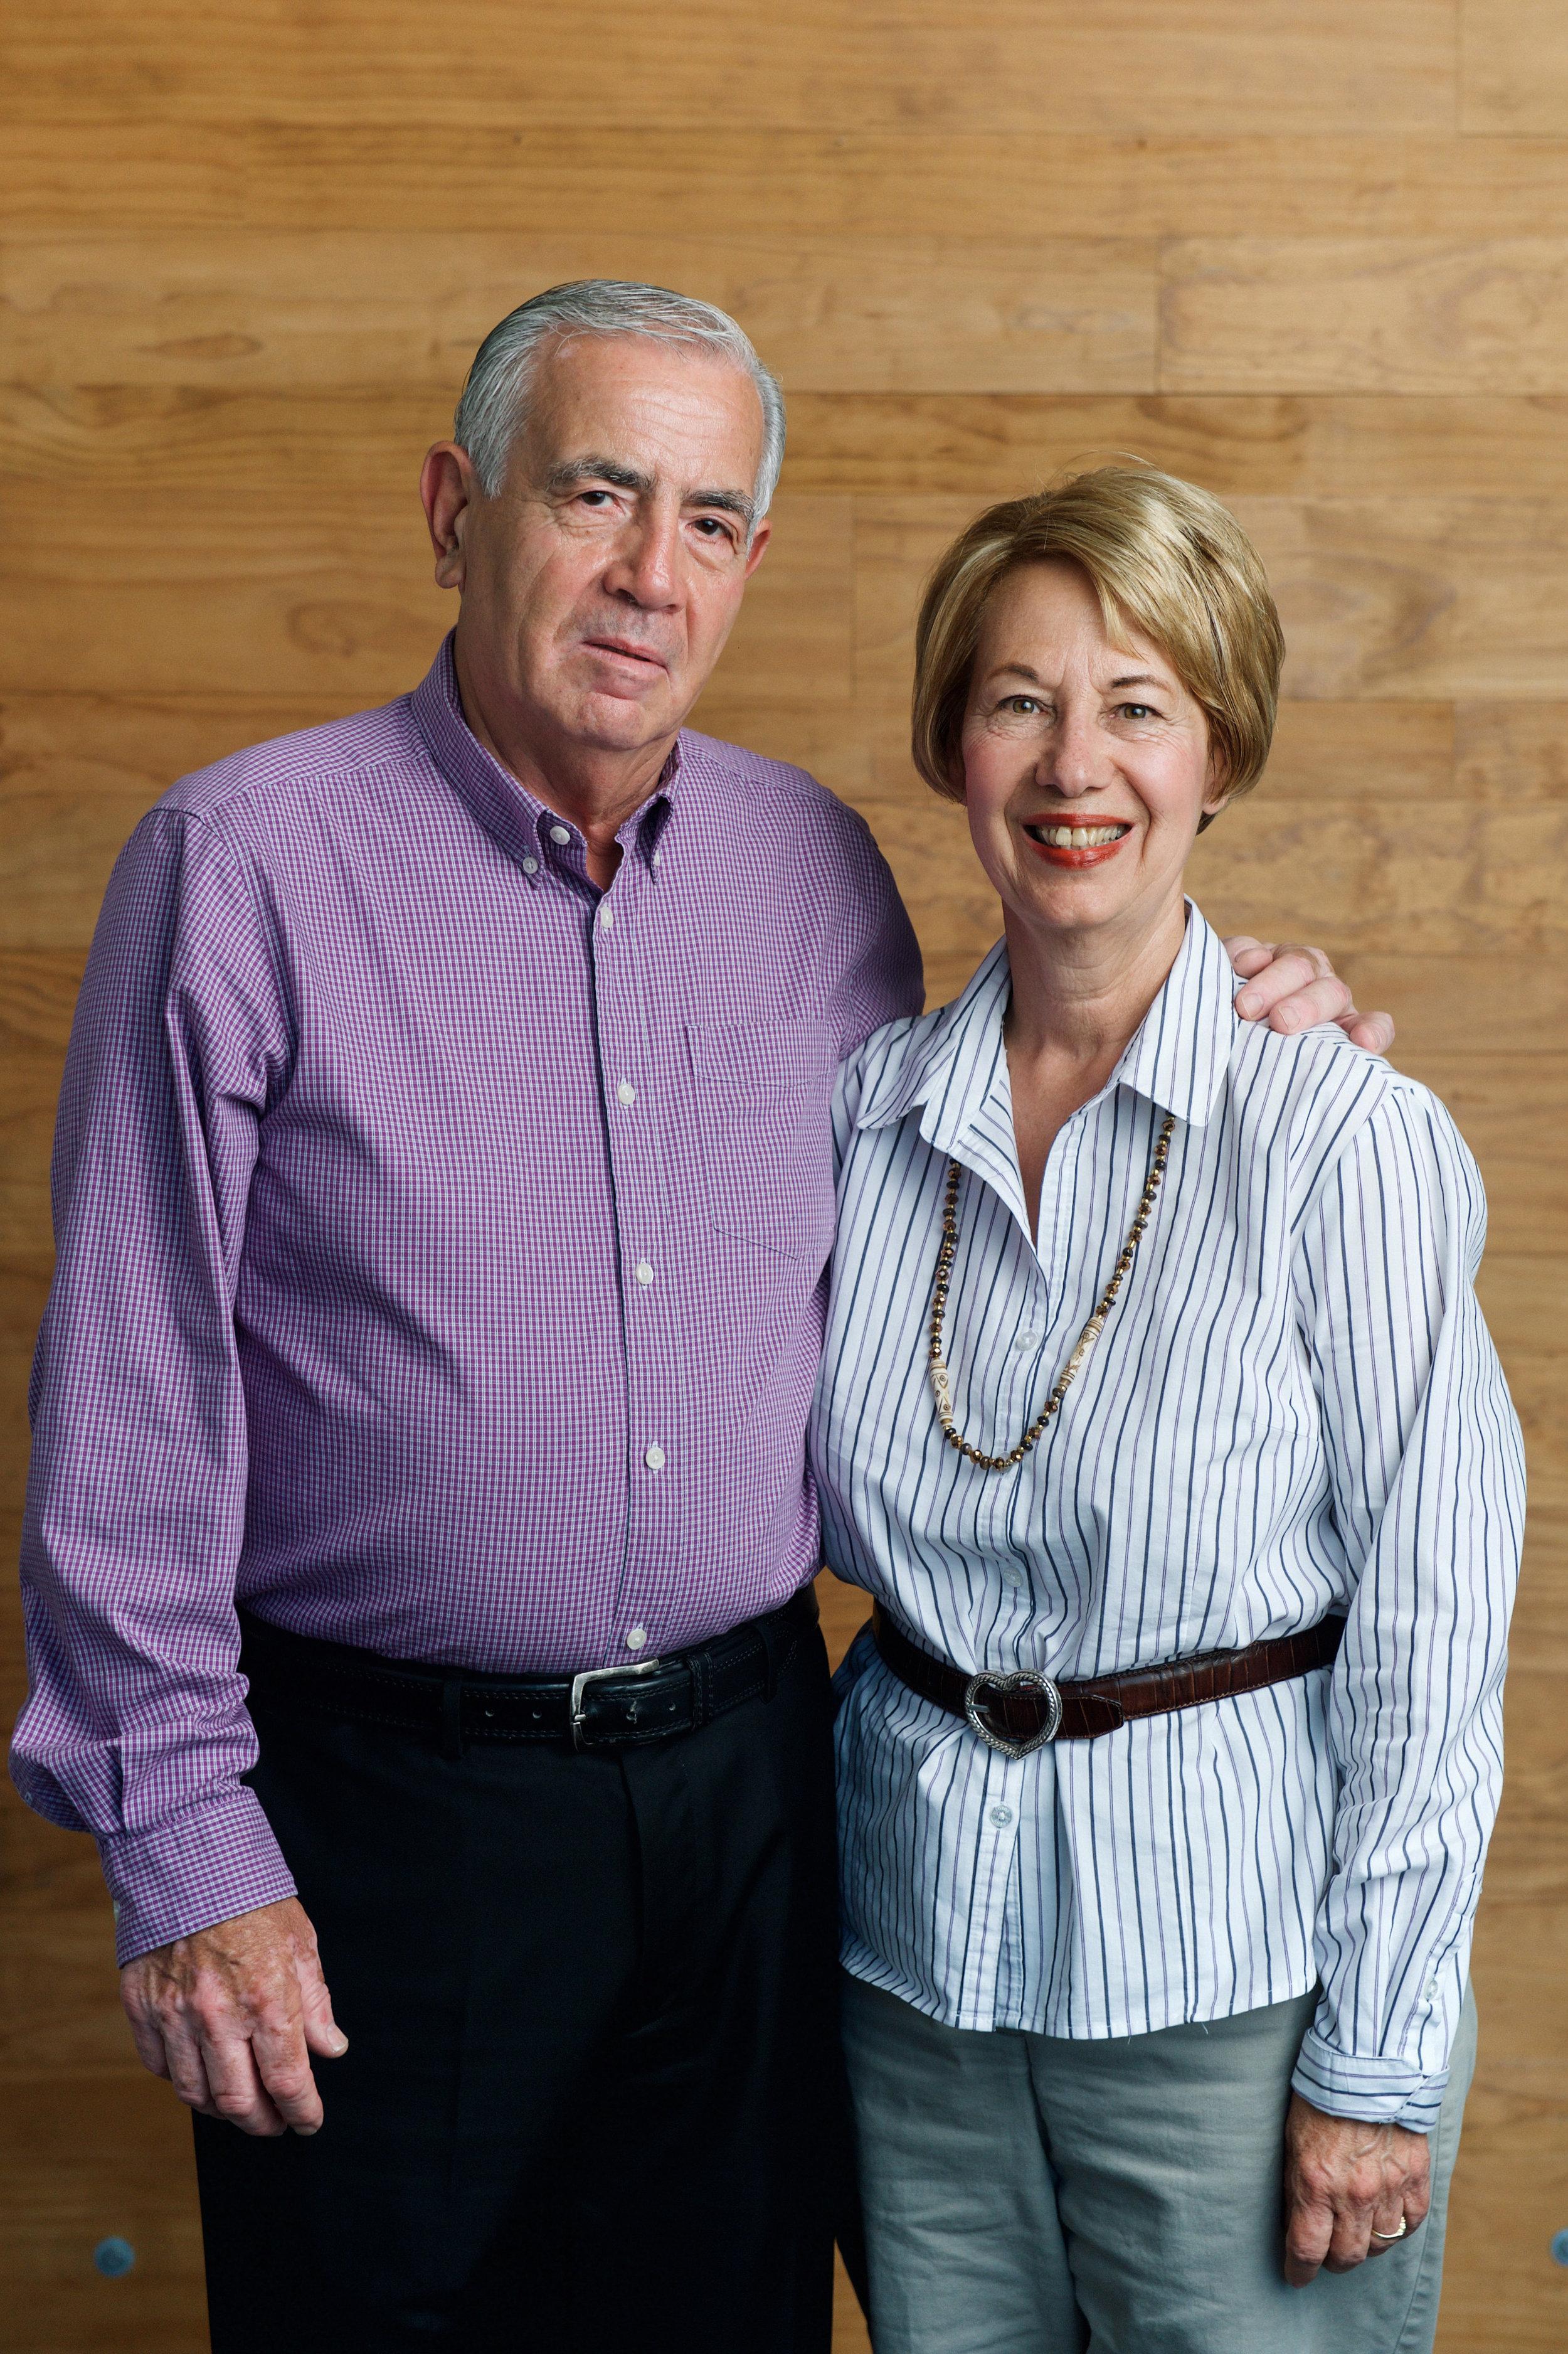 Terry & Cindy Sisneros